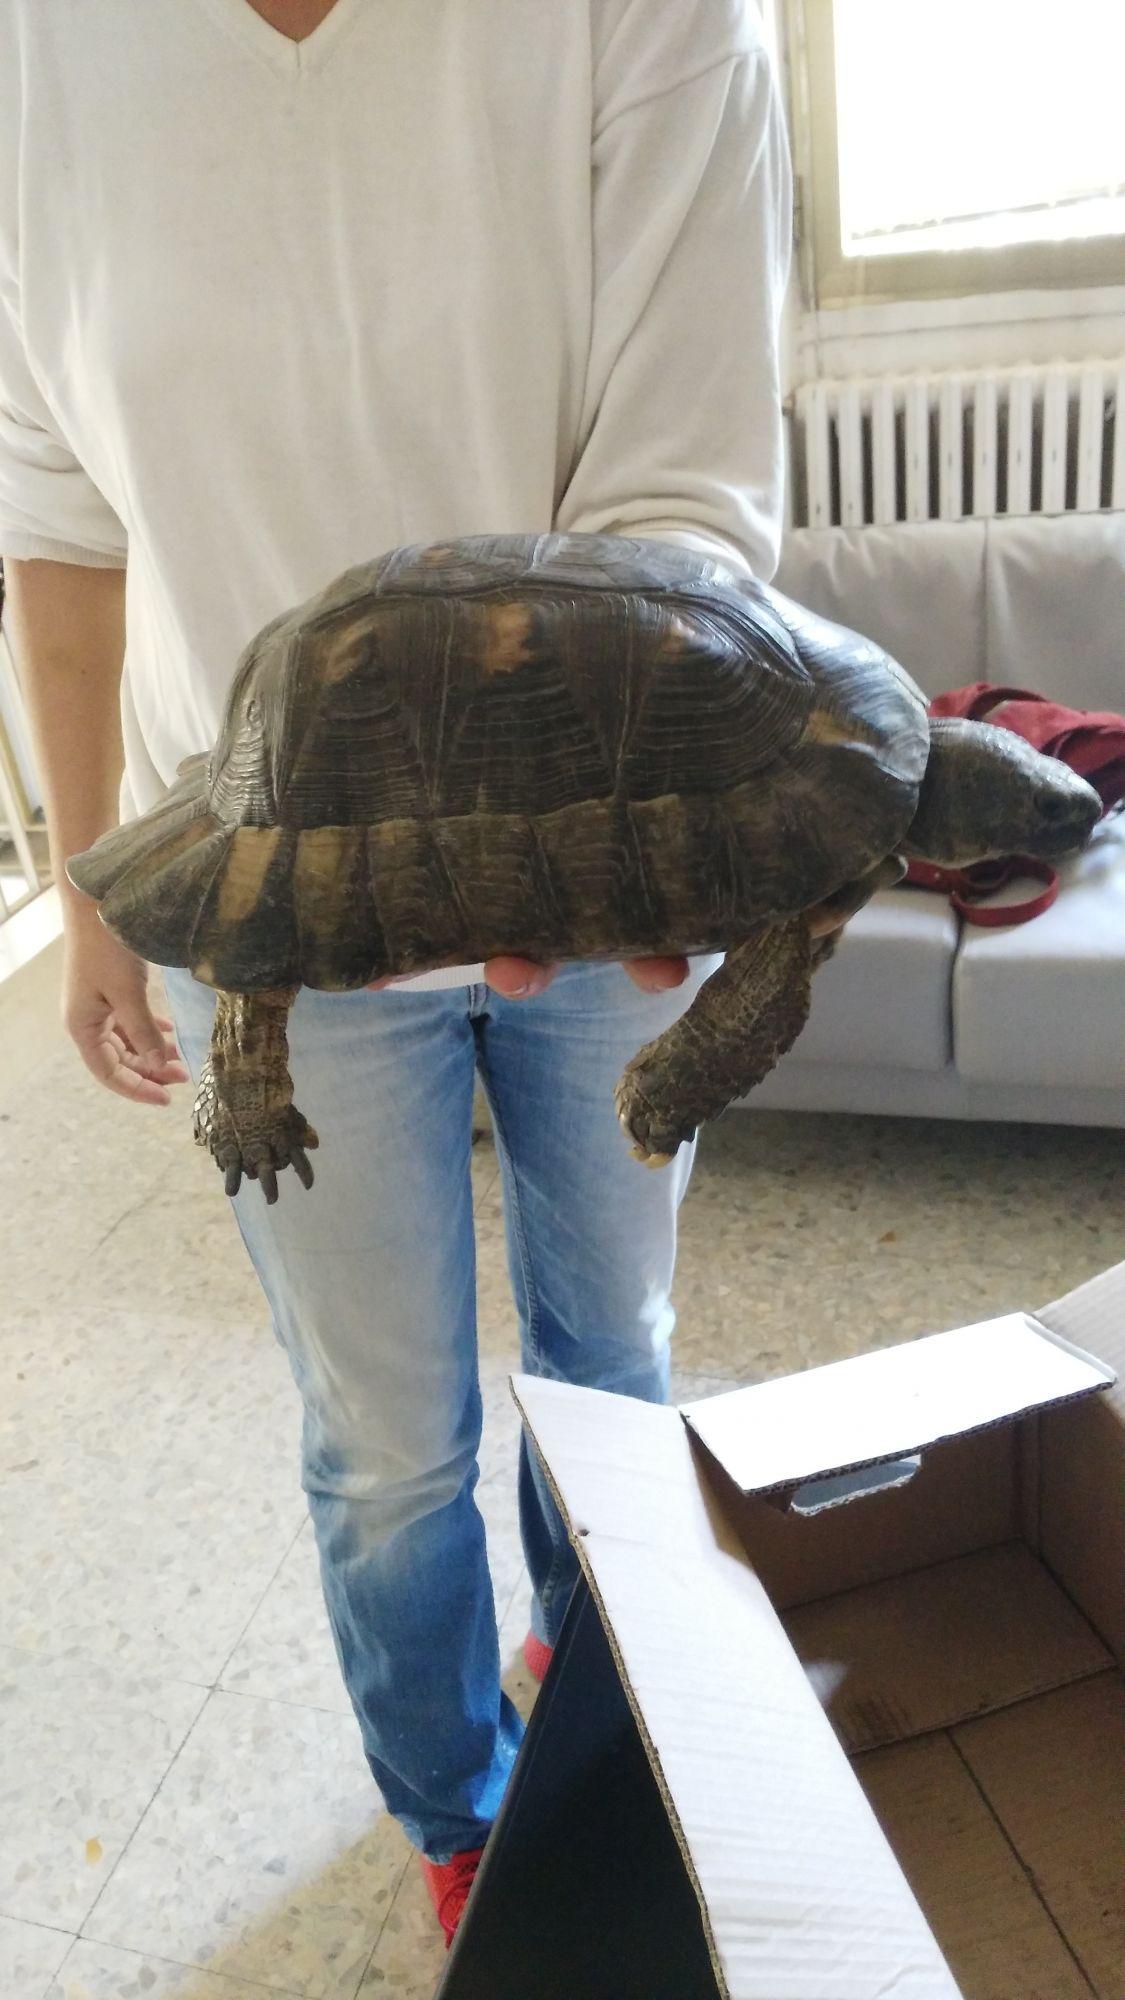 Tartaruga terrestre sarda trovata e consegnata ai Forestali